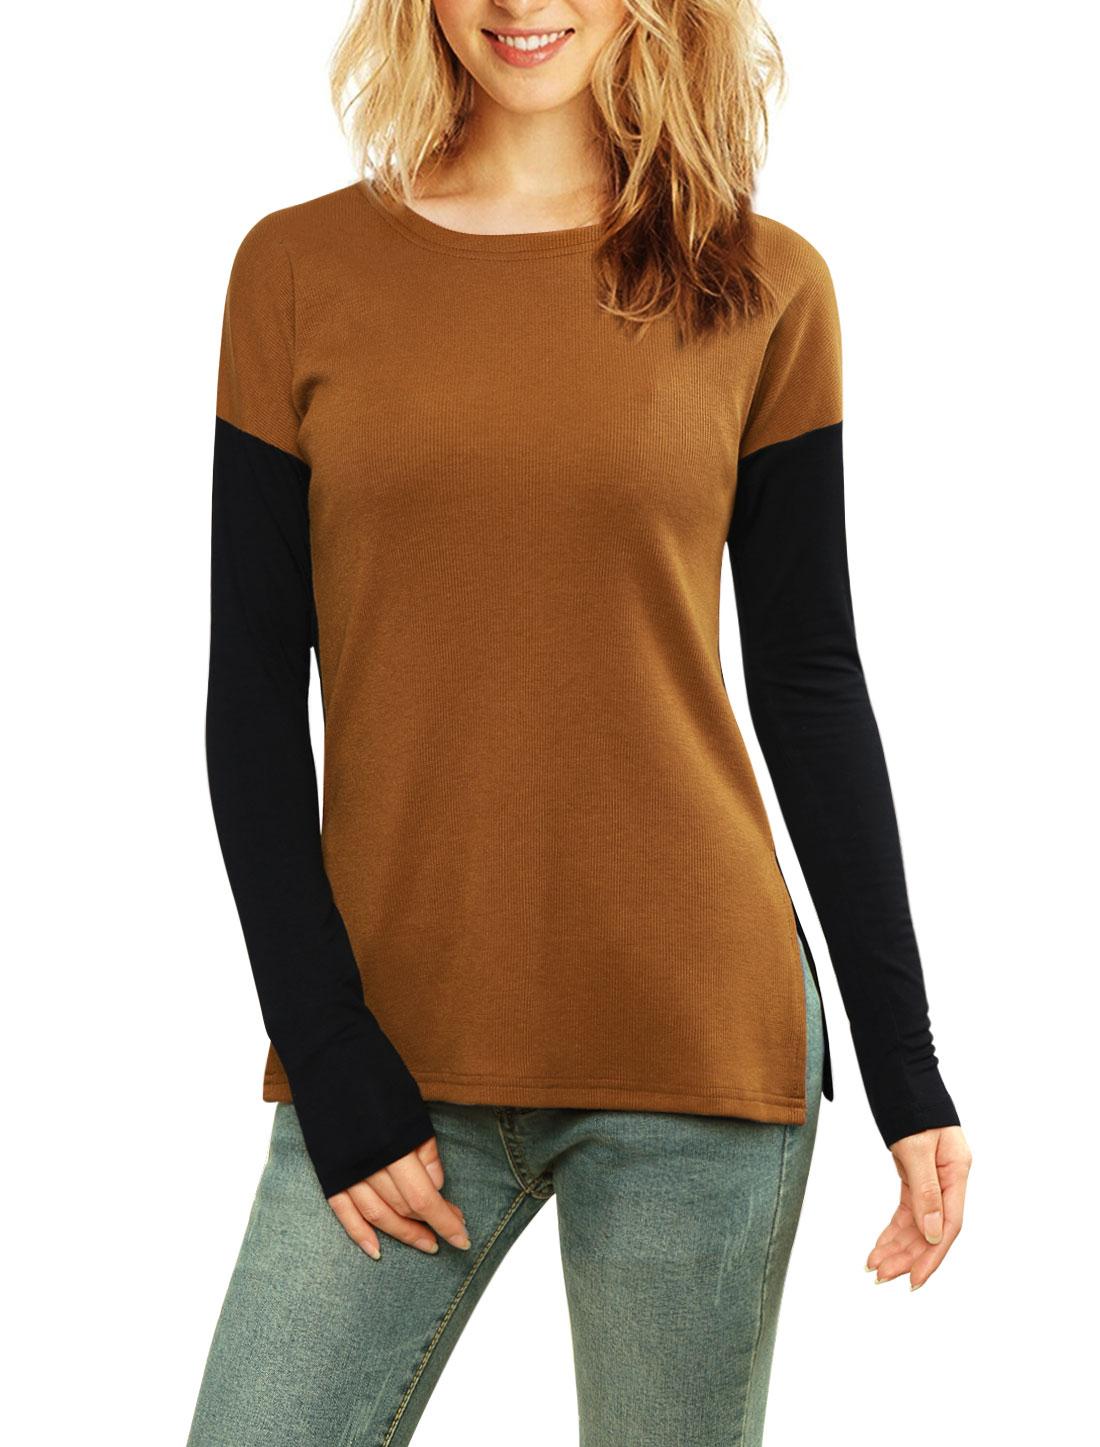 Women Color Block Side-Slit Paneled Slim Fit Ribbed Top Brown M